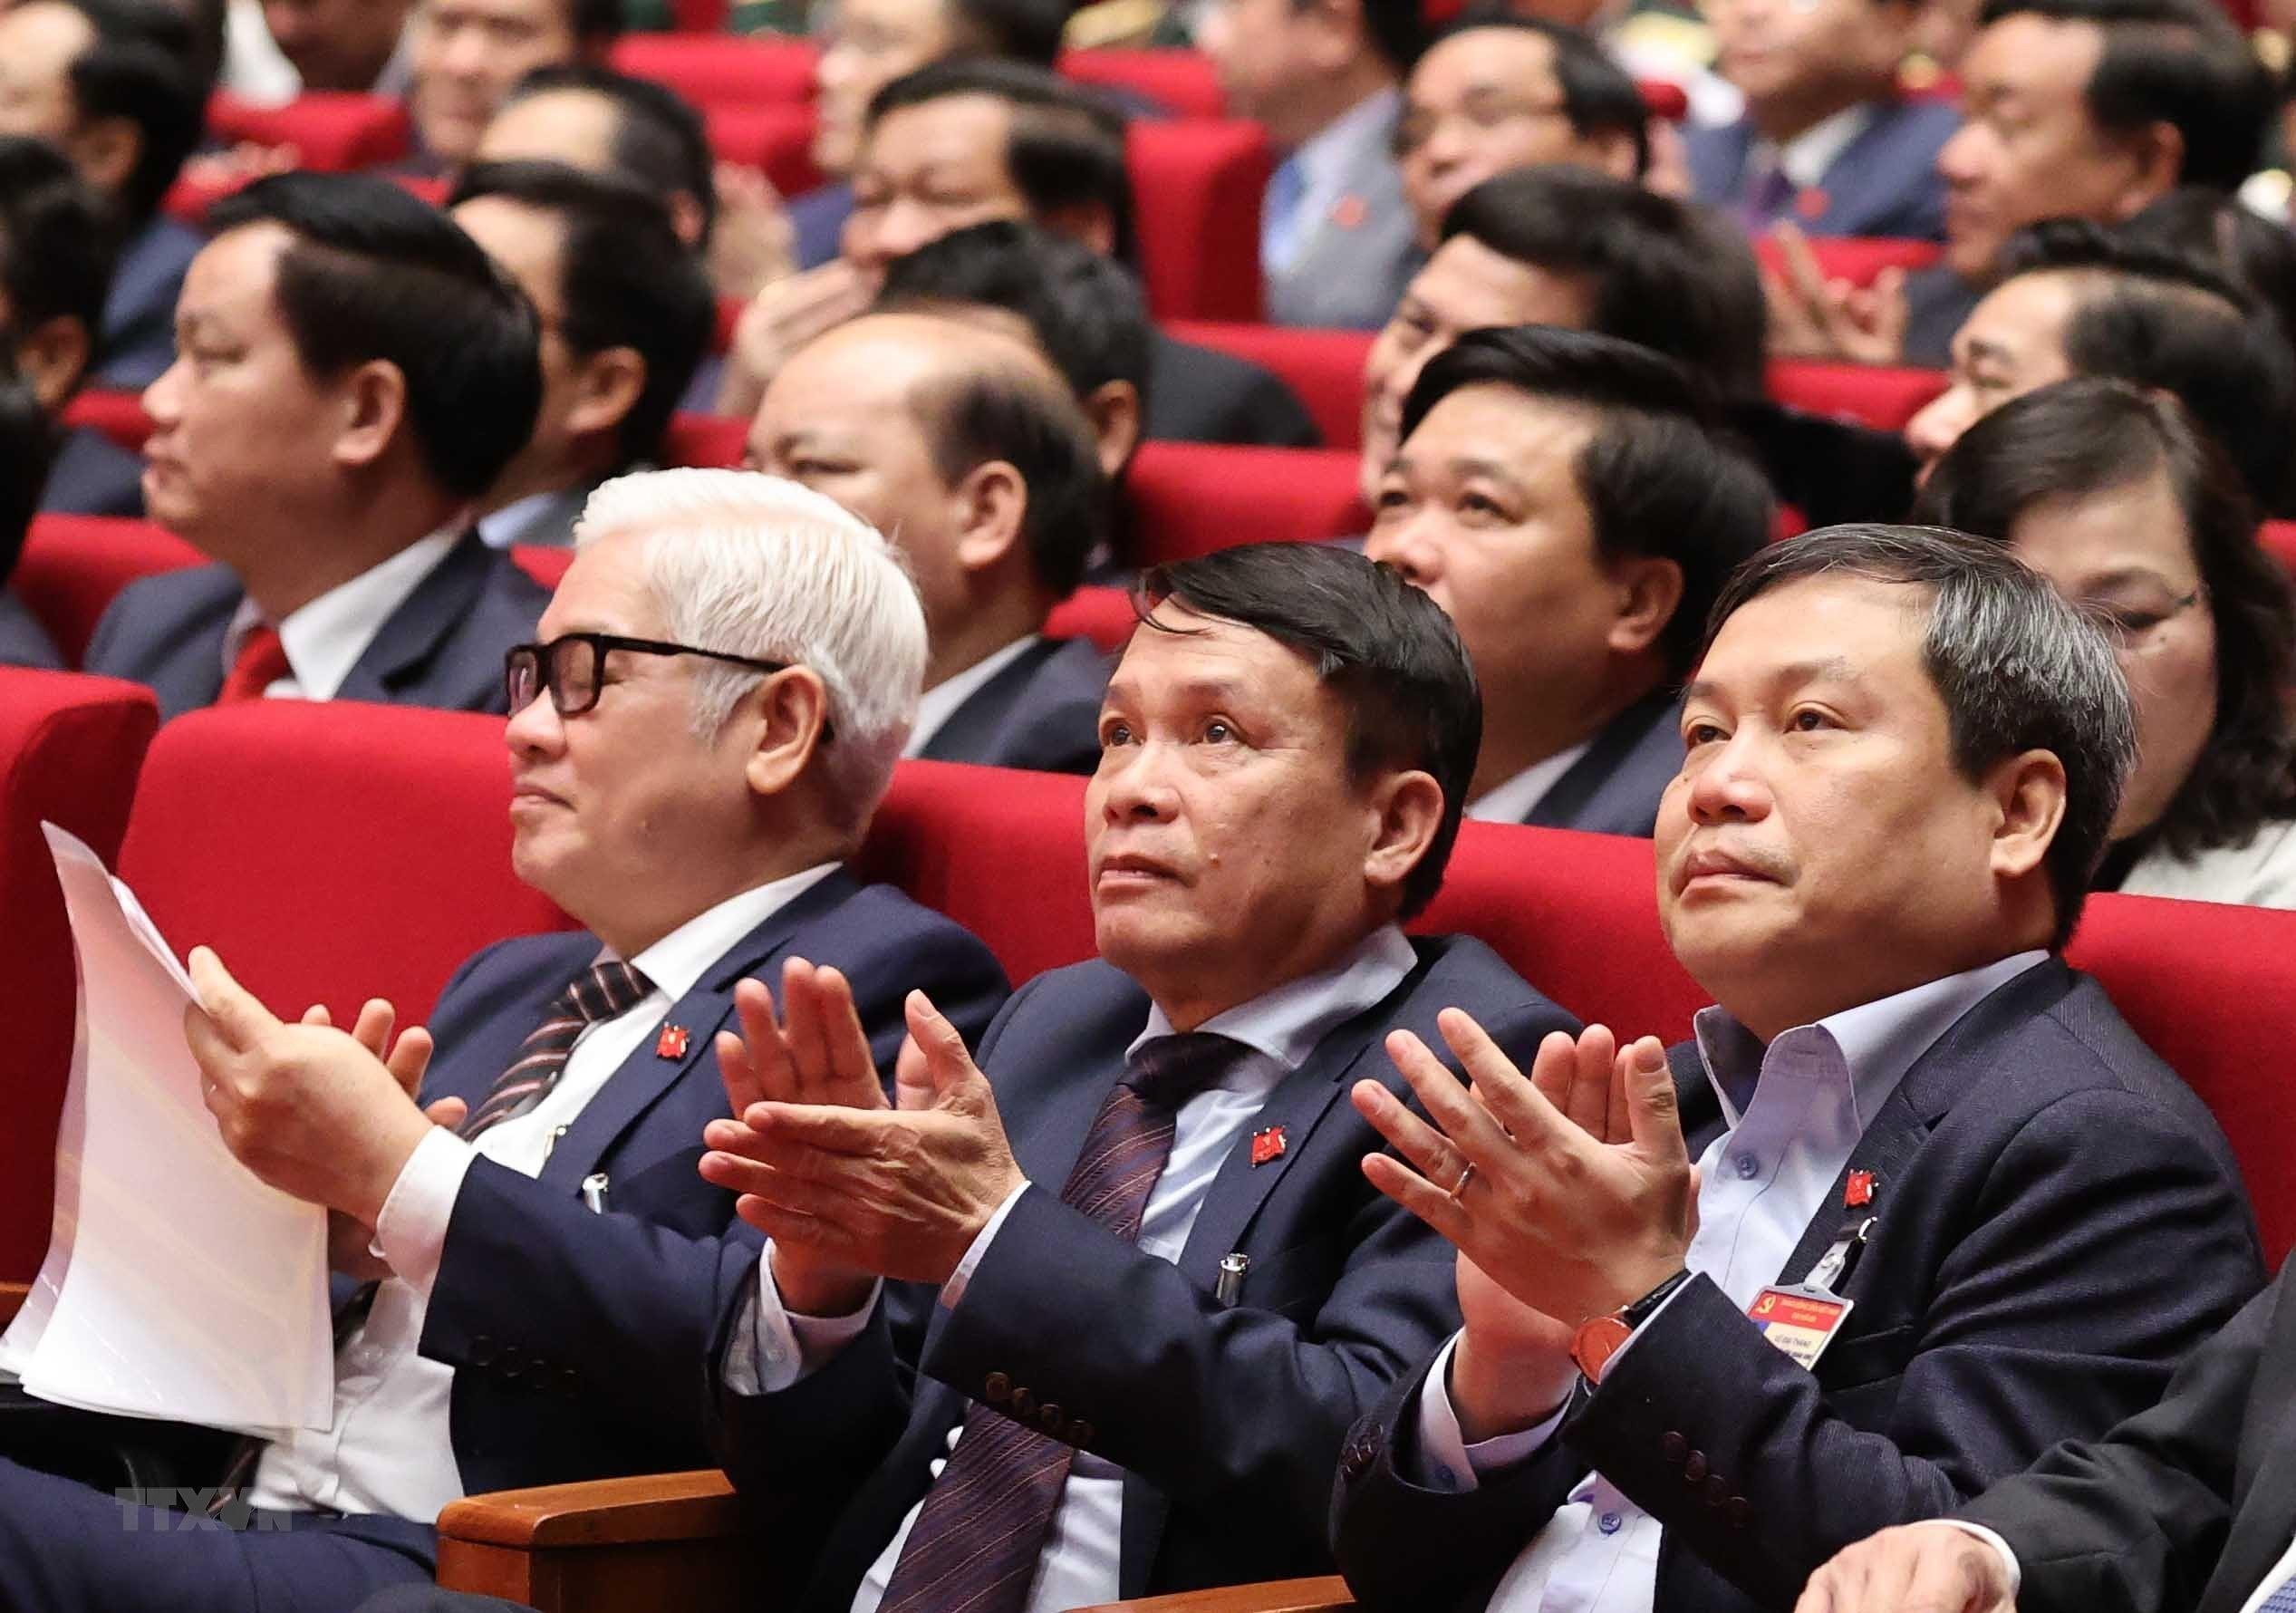 [Photo] Quang canh phien thao luan cac van kien Dai hoi XIII cua Dang hinh anh 31